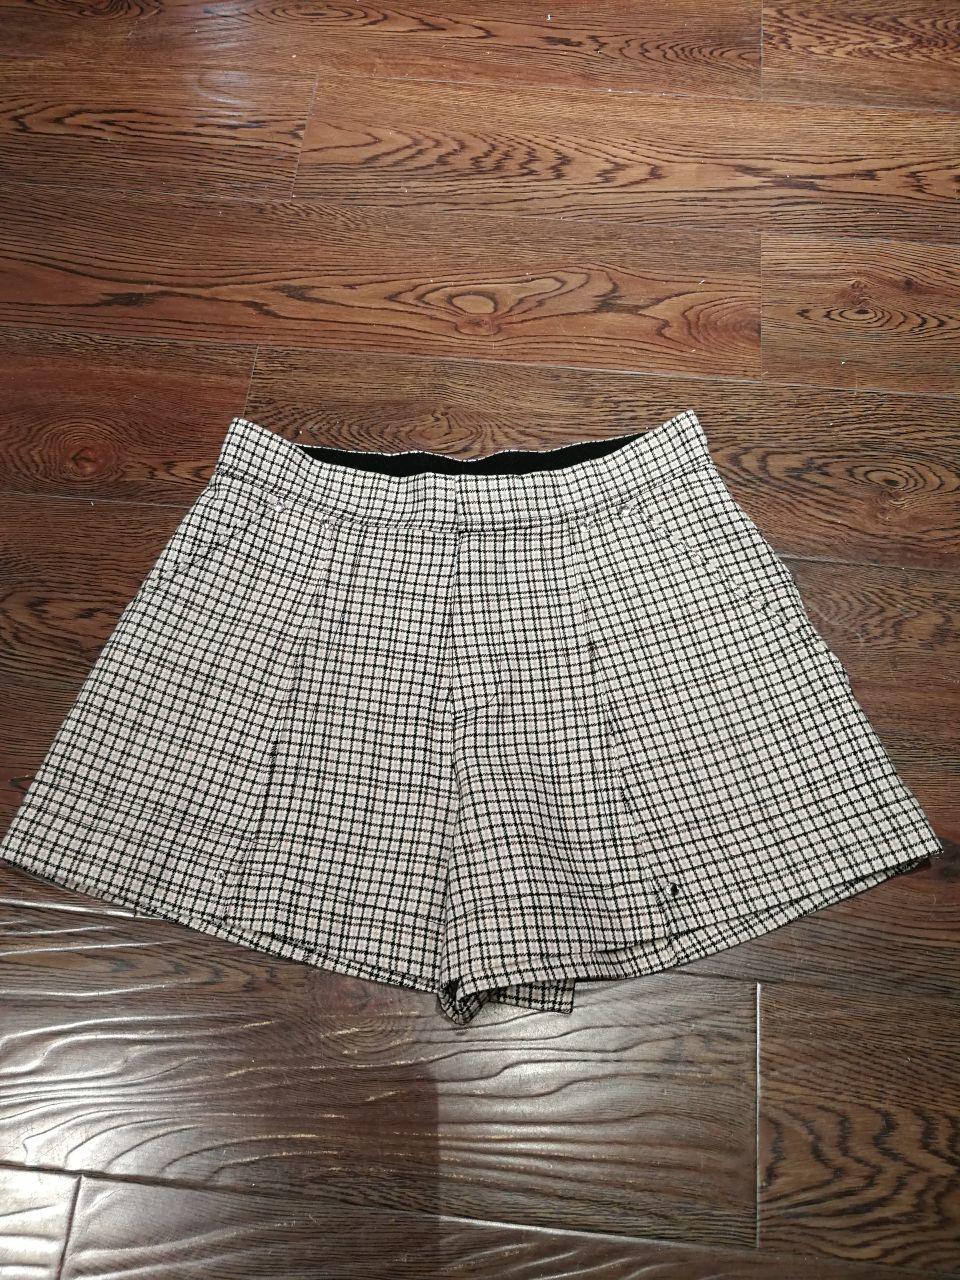 2019 ladies fashion loose casual check shorts 0725